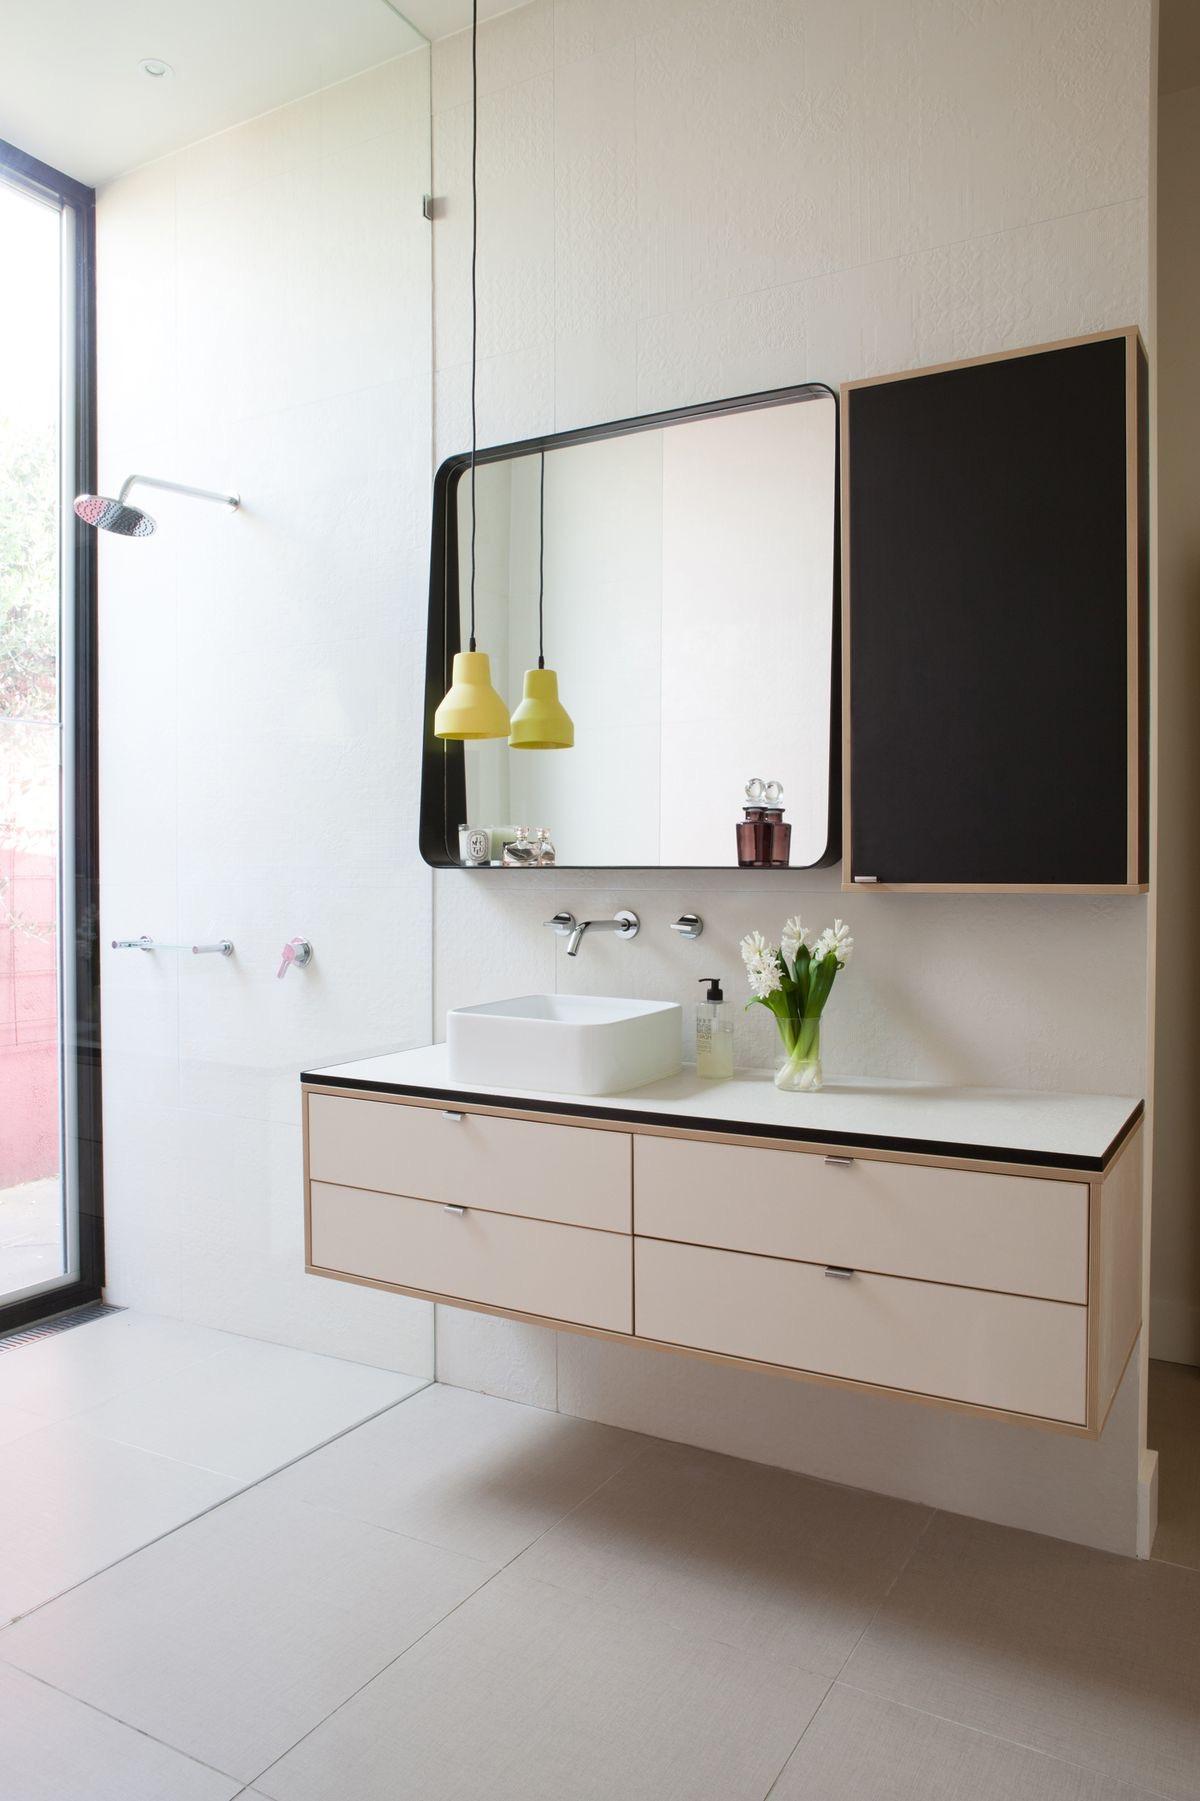 Doherty Design Studio's Yarraville residence. Photography by Gorta Yuuki.